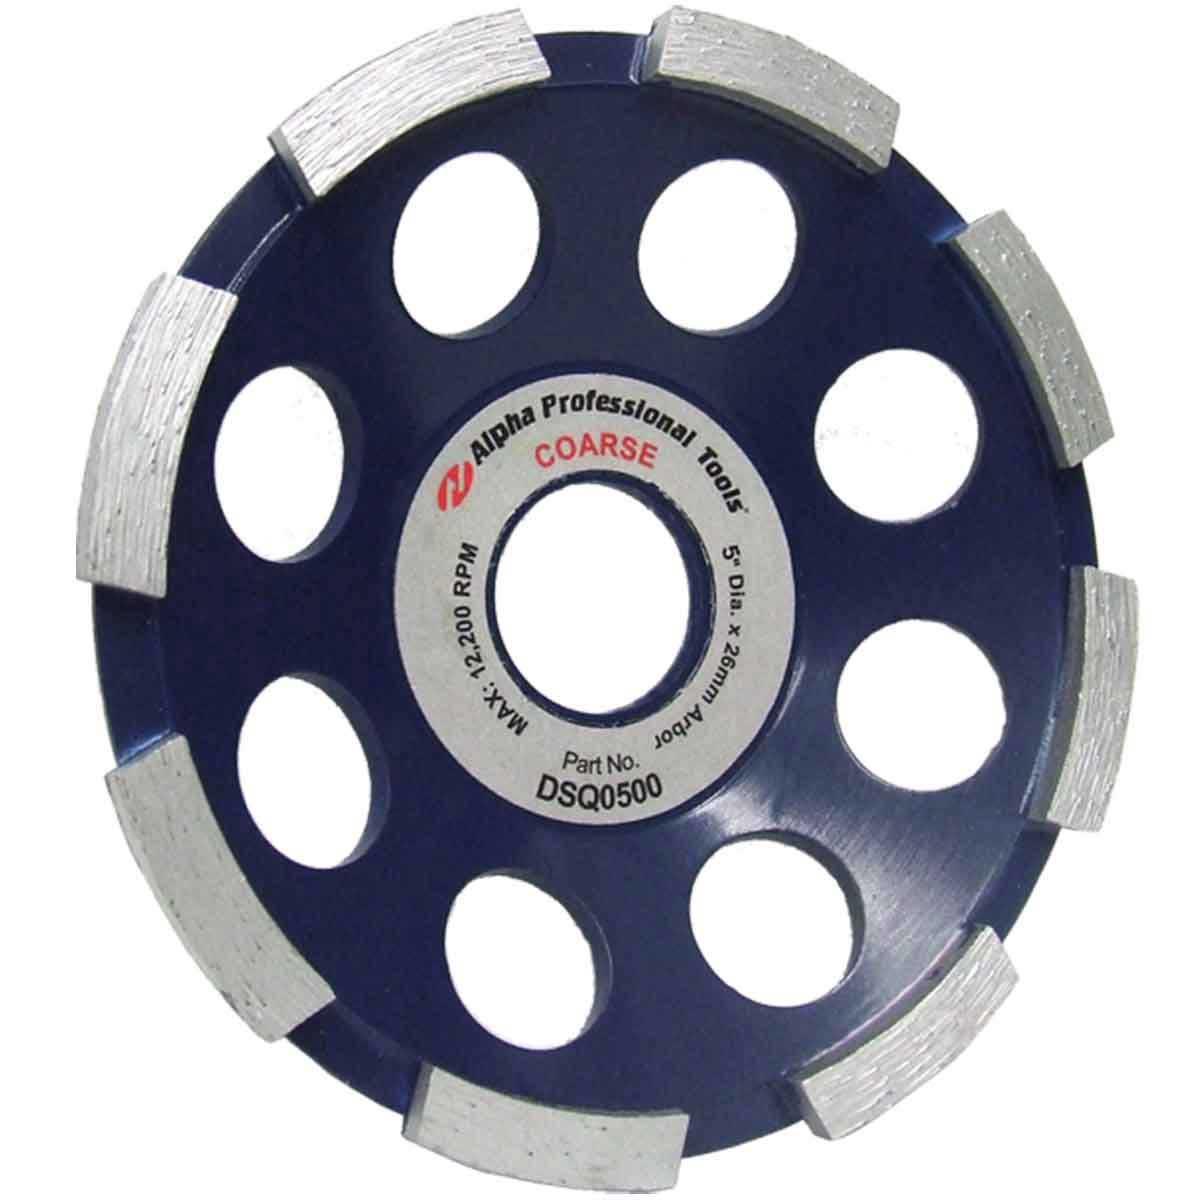 Alpha 5 inch Segmented Grinding Wheel